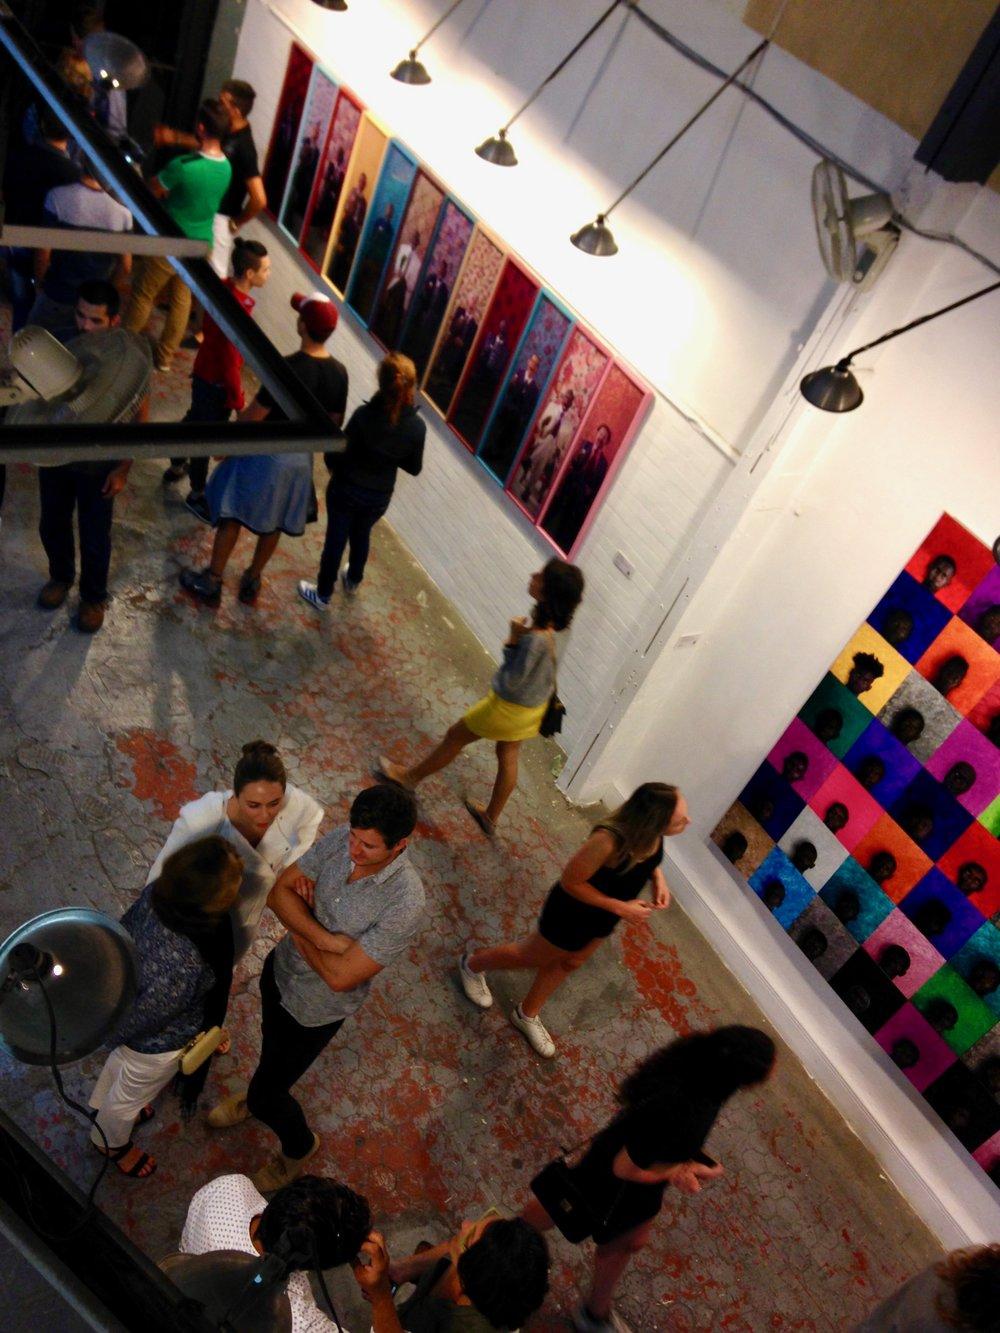 Fábrica de Arte Cubano. Photo by J. Austria